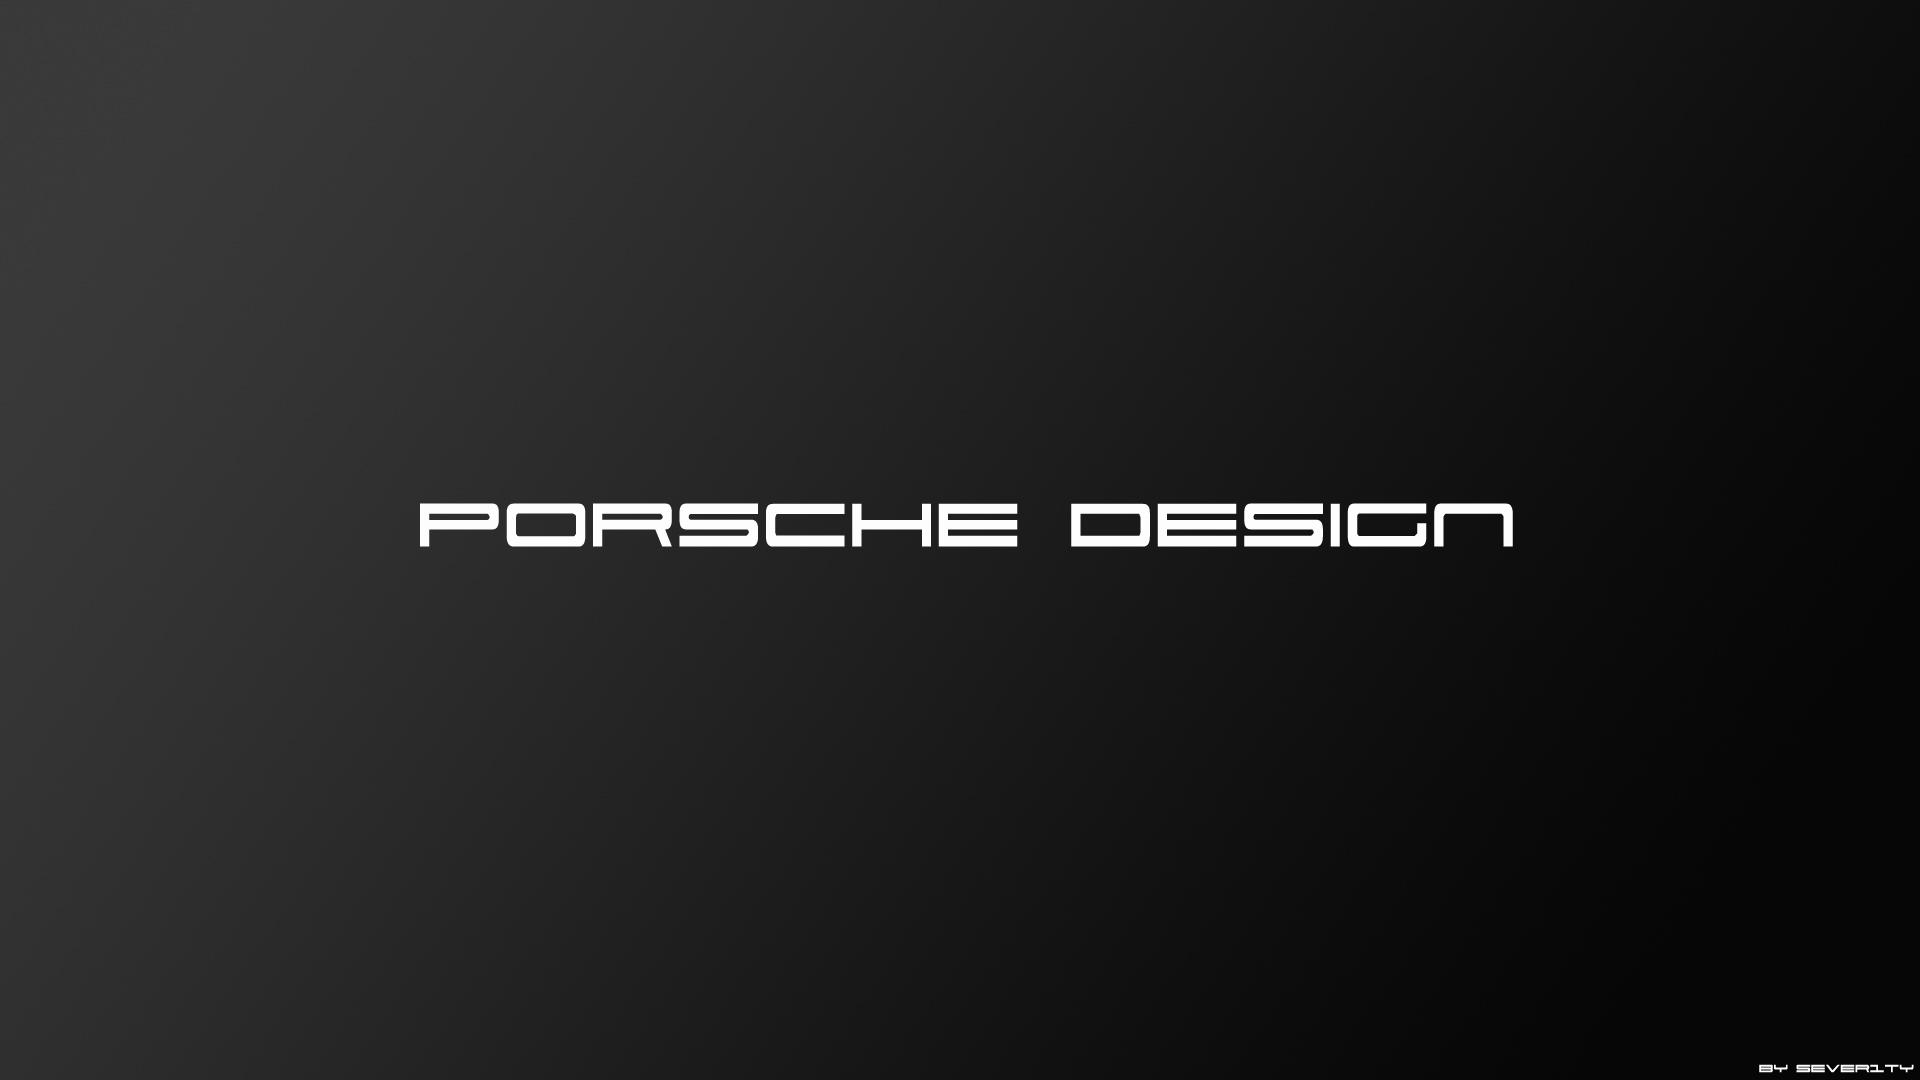 porsche-design-art-severty-316382